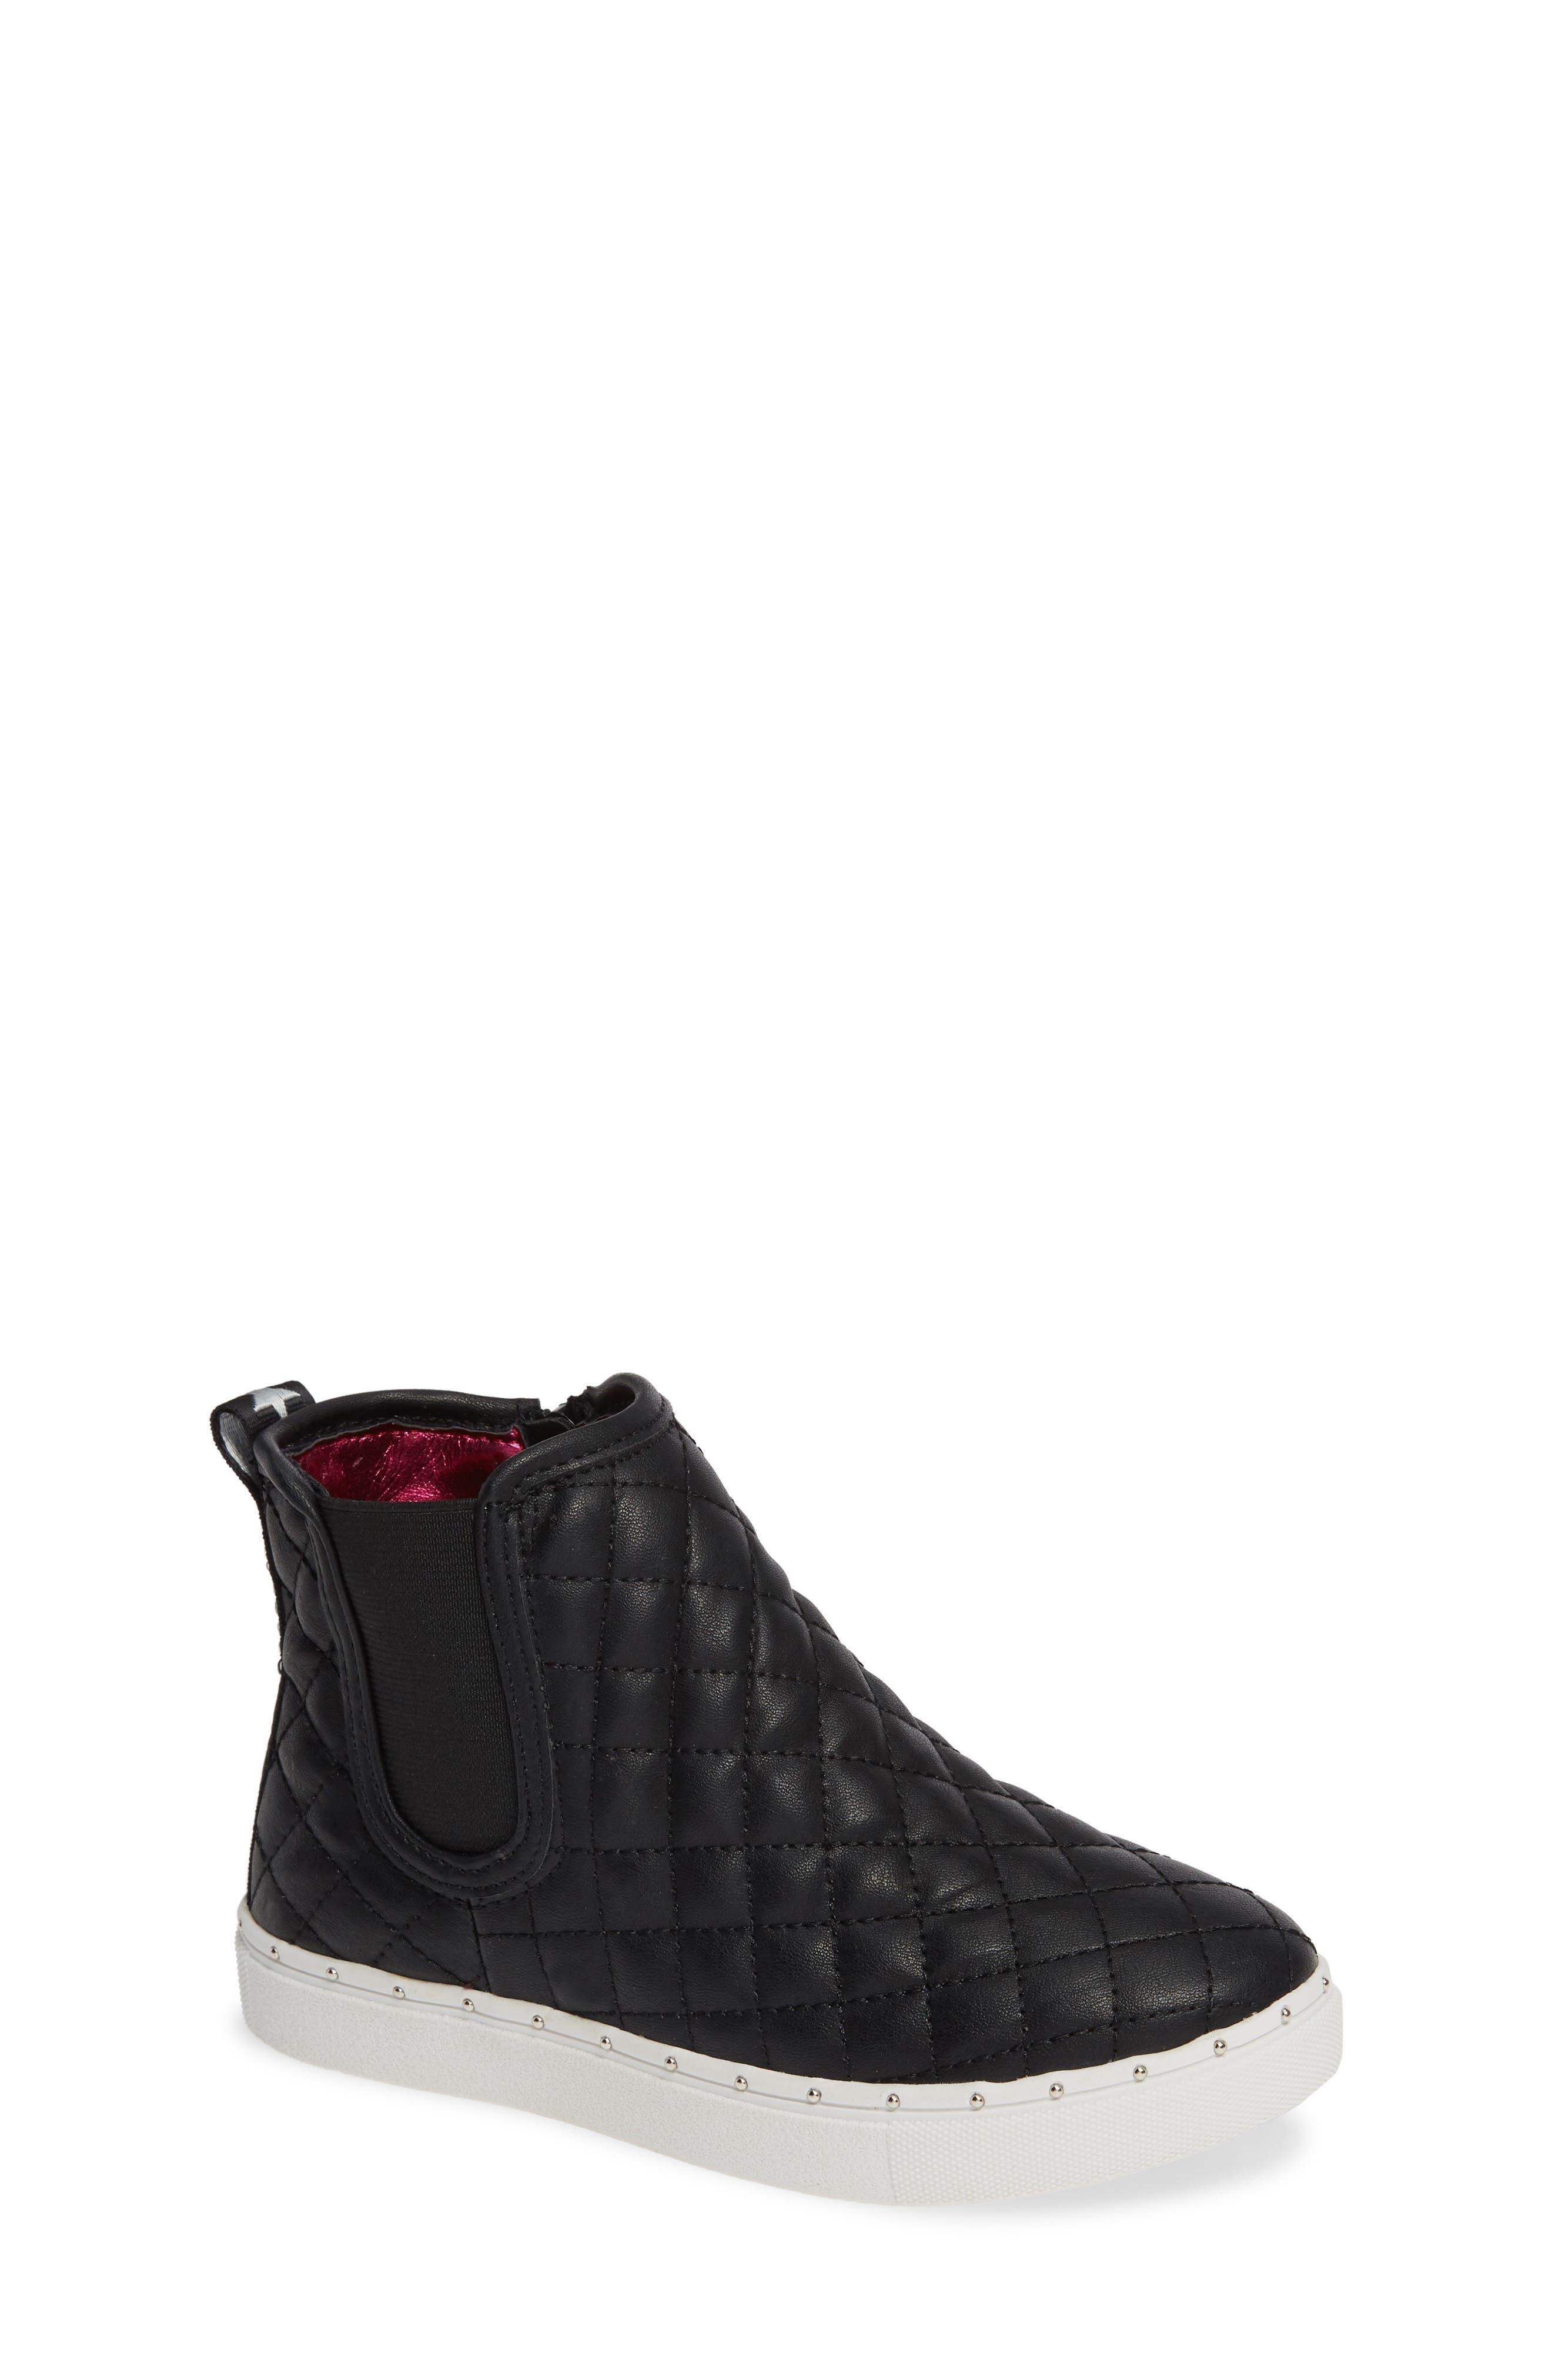 JQuest High Top Platform Sneaker,                         Main,                         color, BLACK